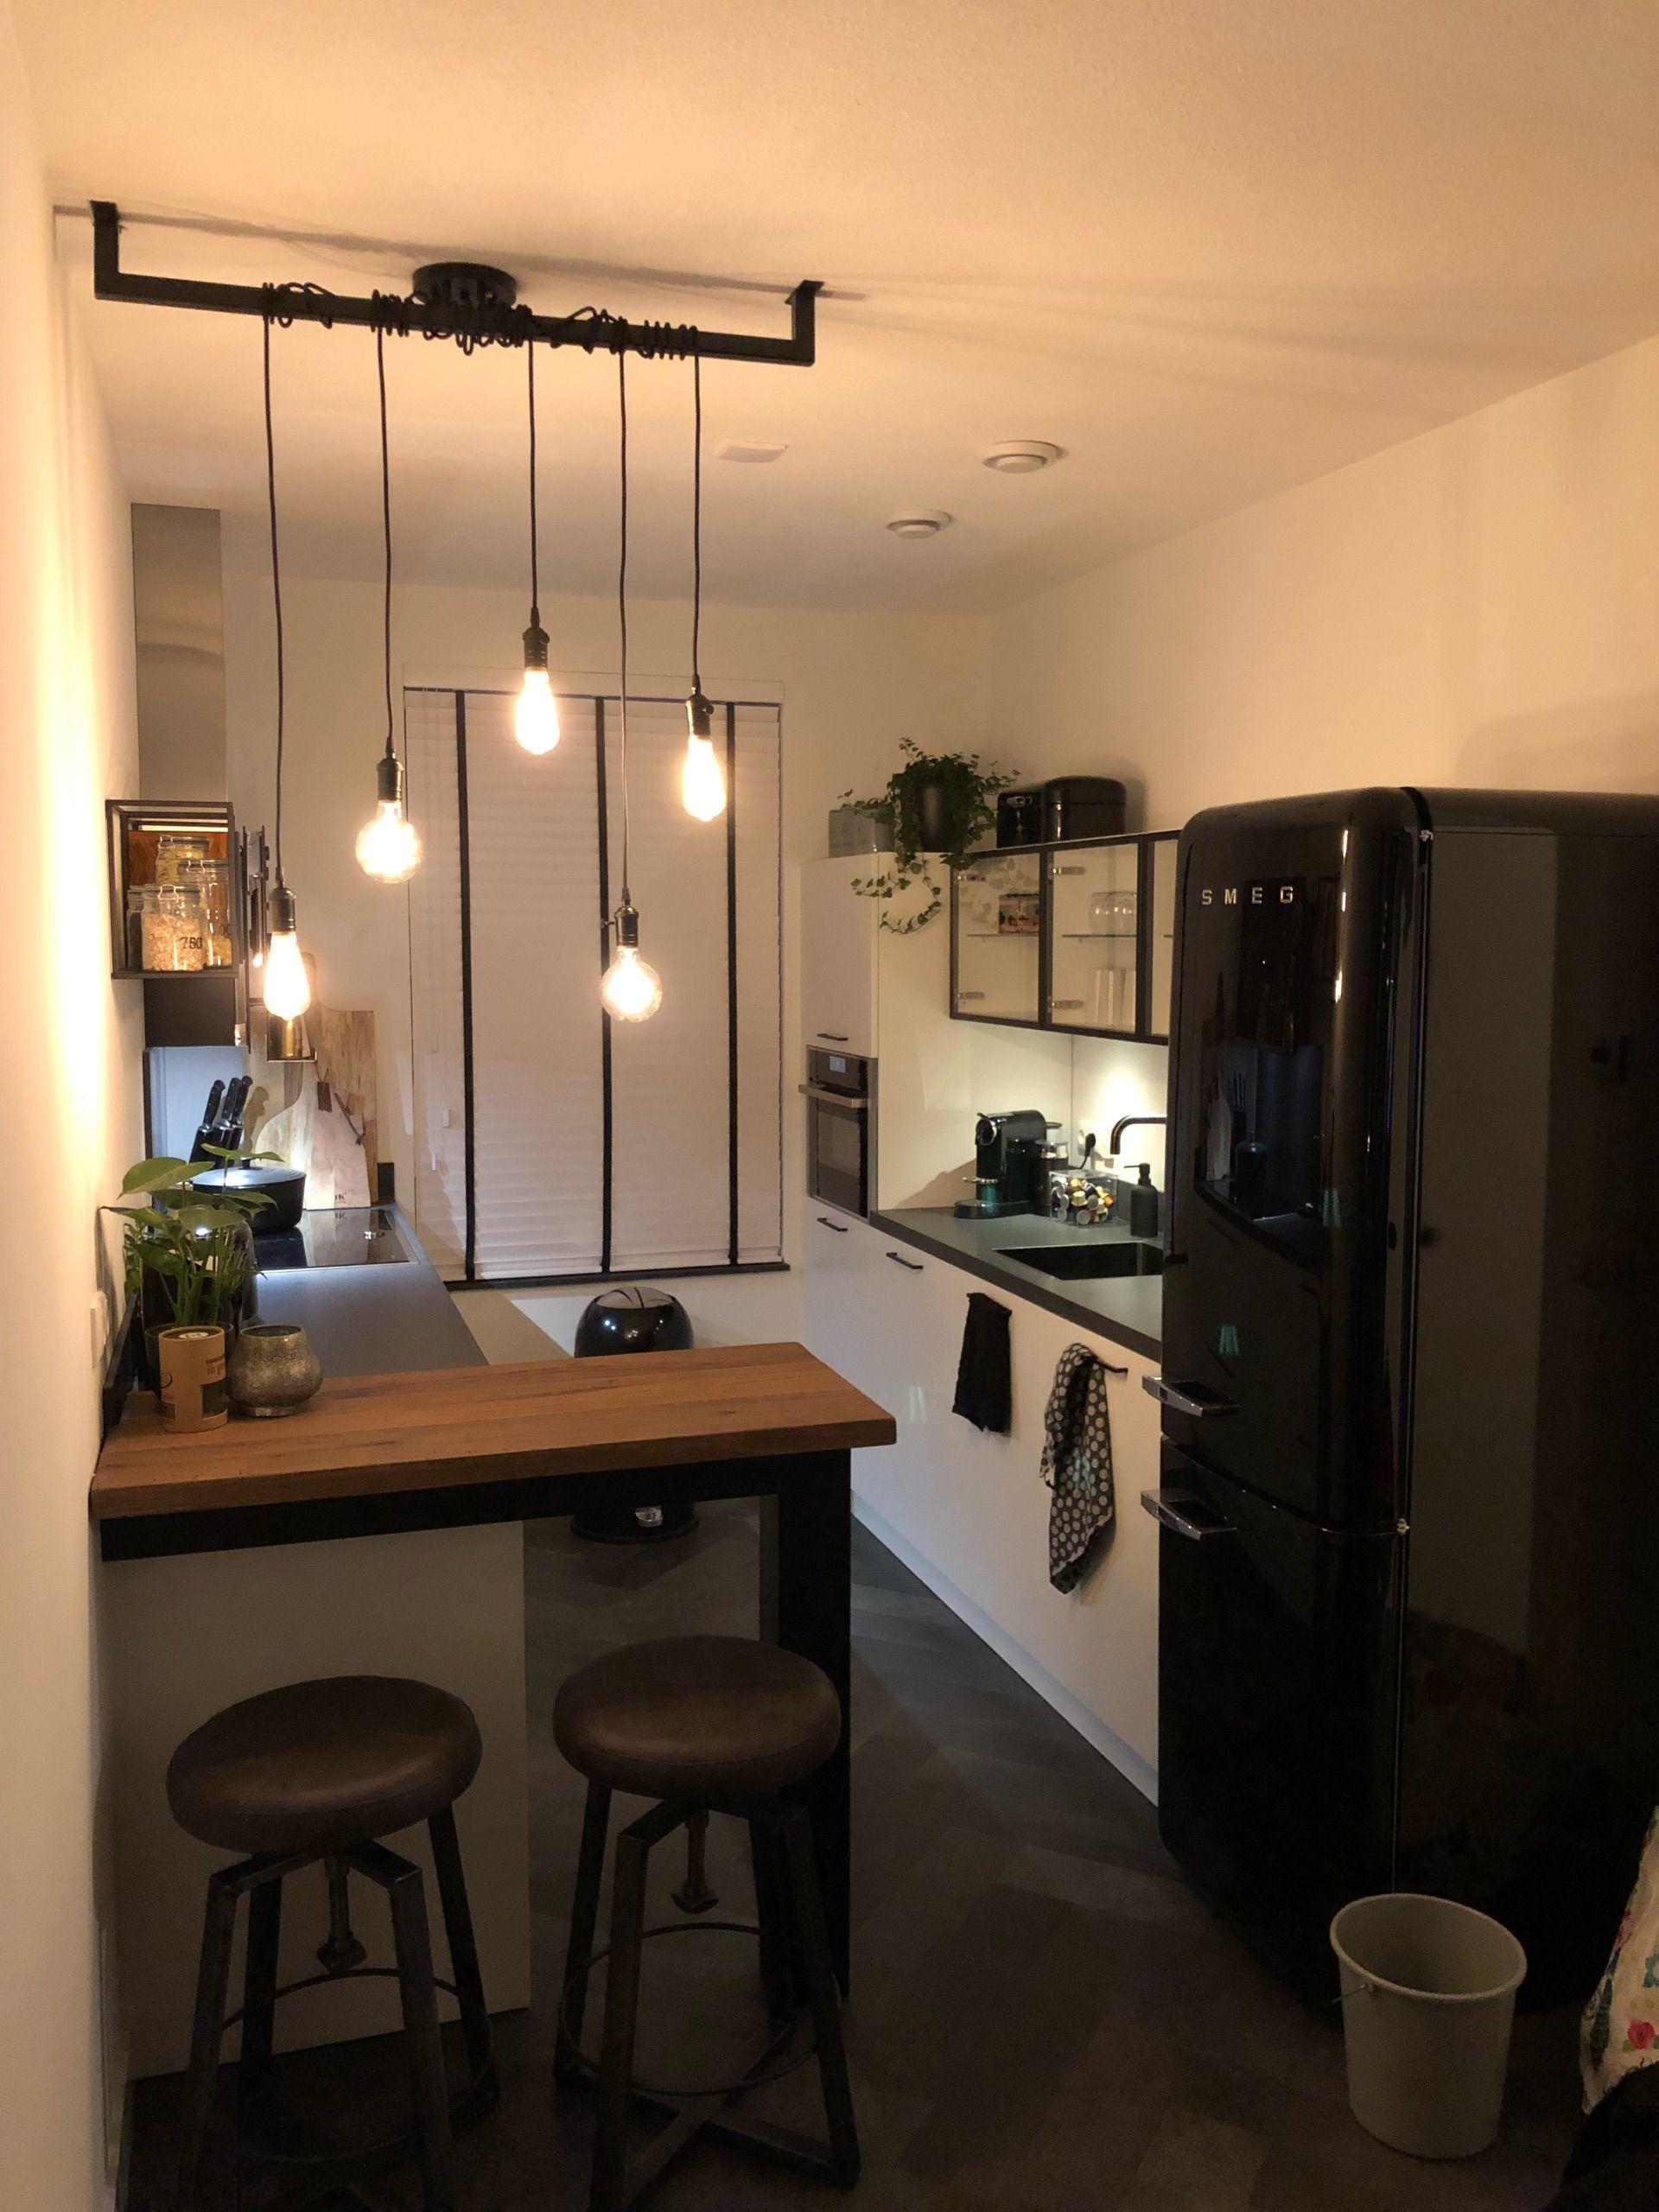 Keuken - Binnenkijken bij nkraaijeveld